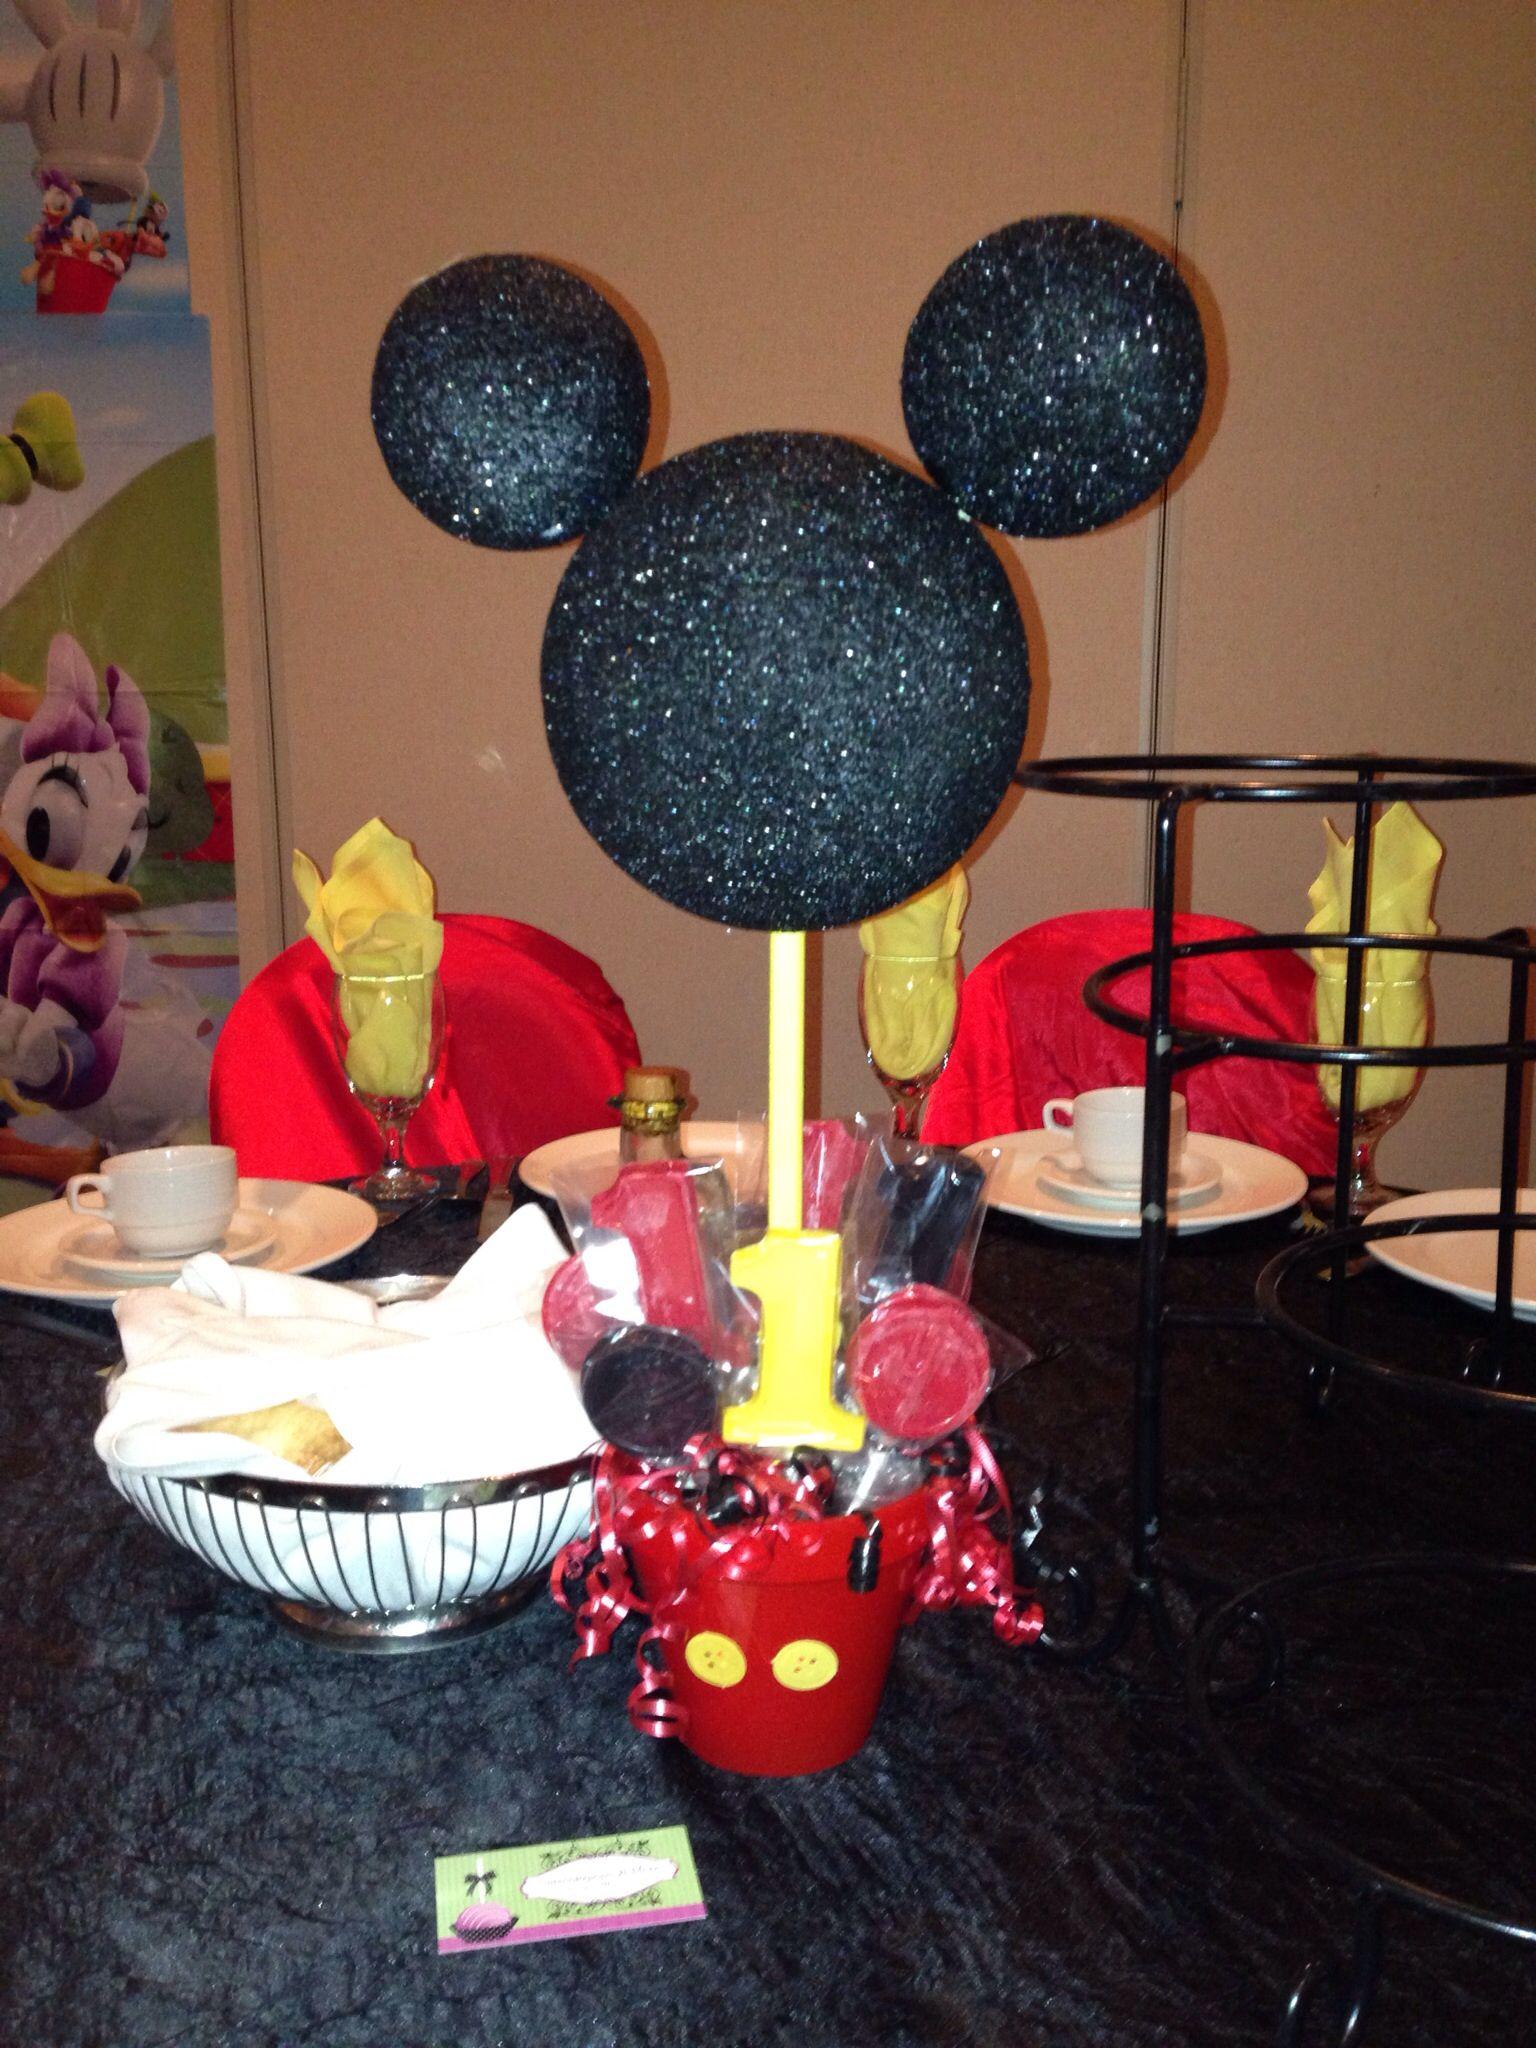 Mickey Mouse Custom Center Piece With Chocolate Sucker